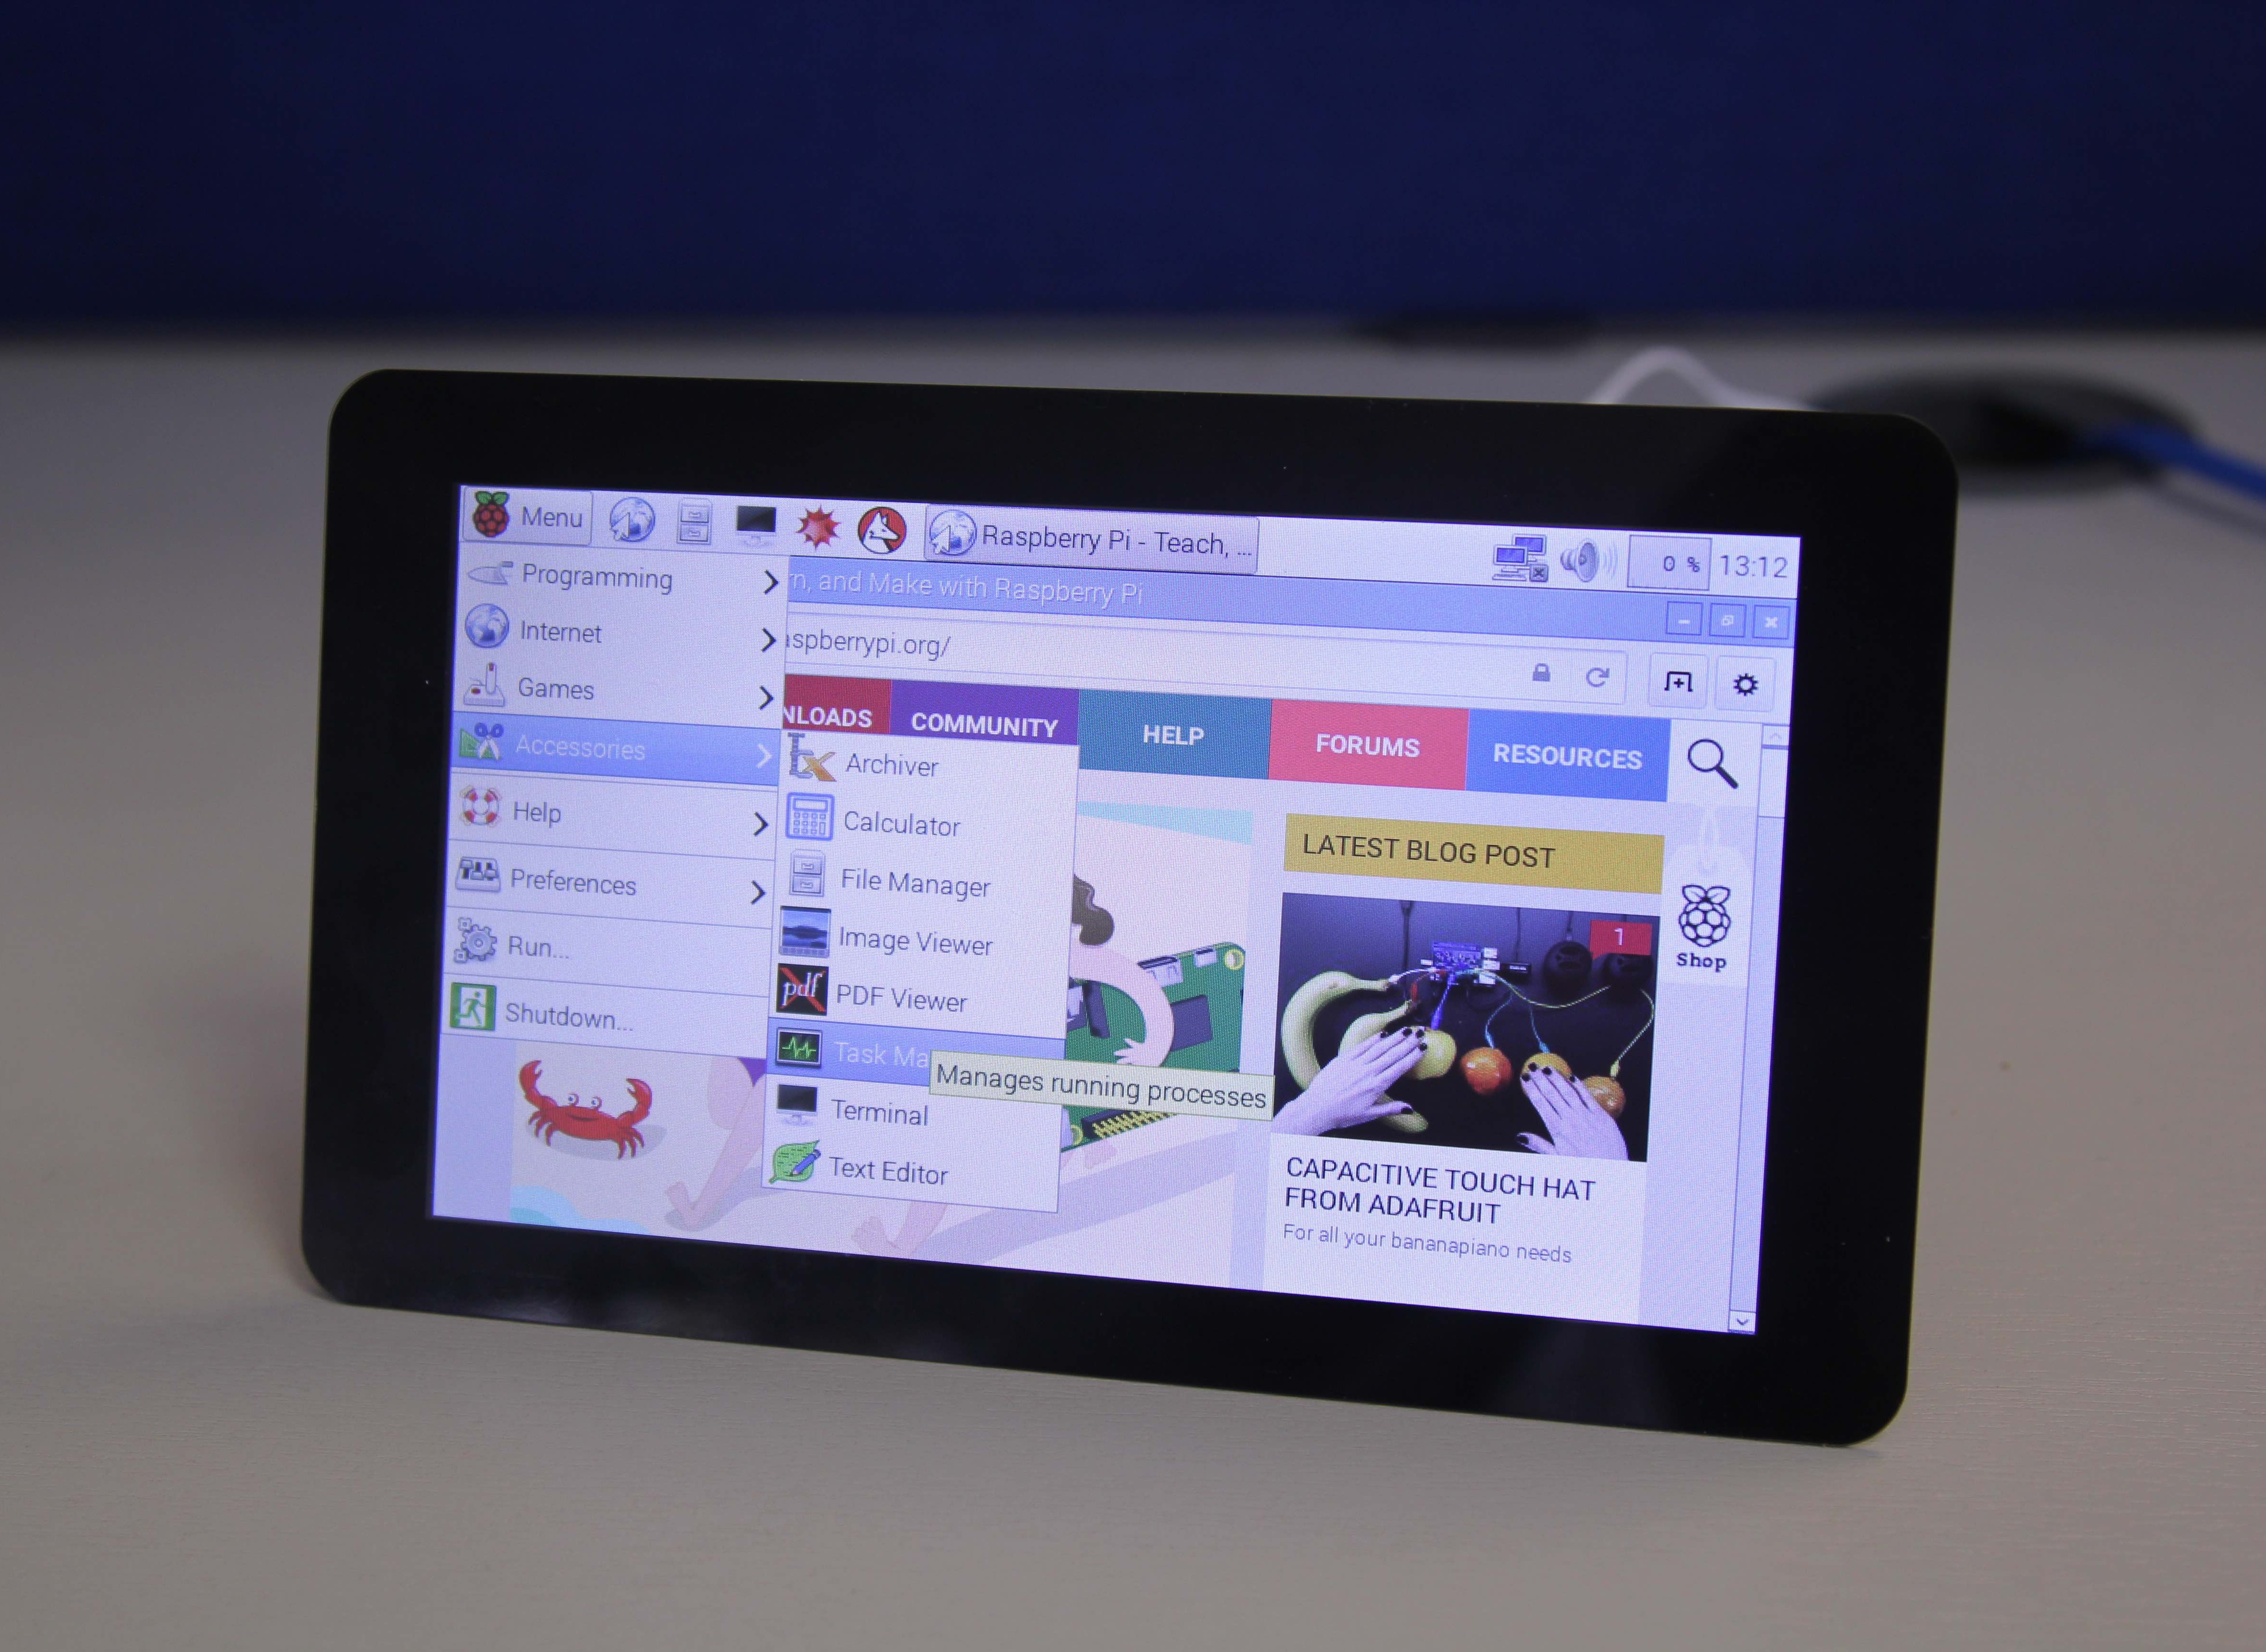 Raspberry Pi screen front